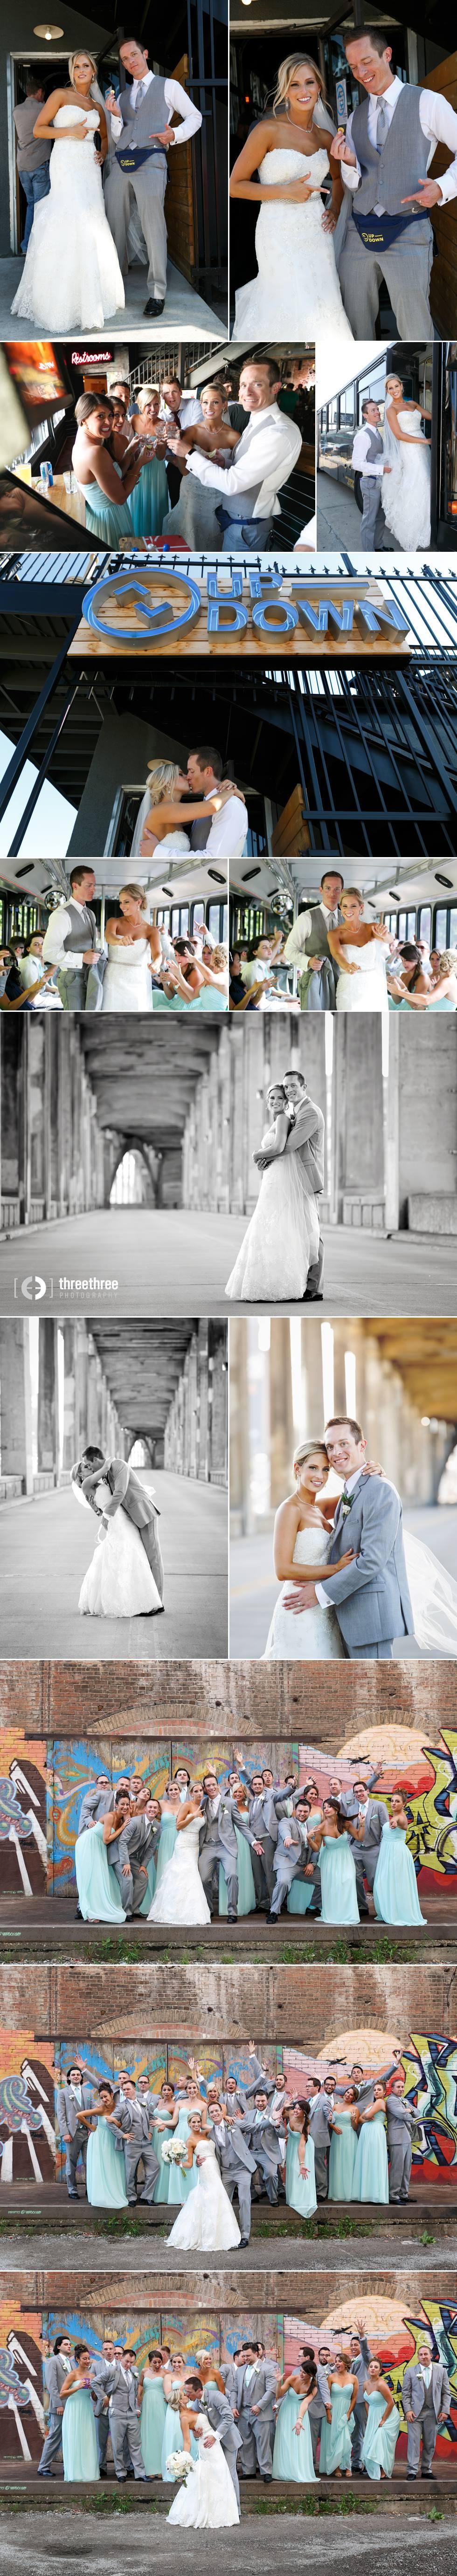 Natalie_AJ_wedding 13